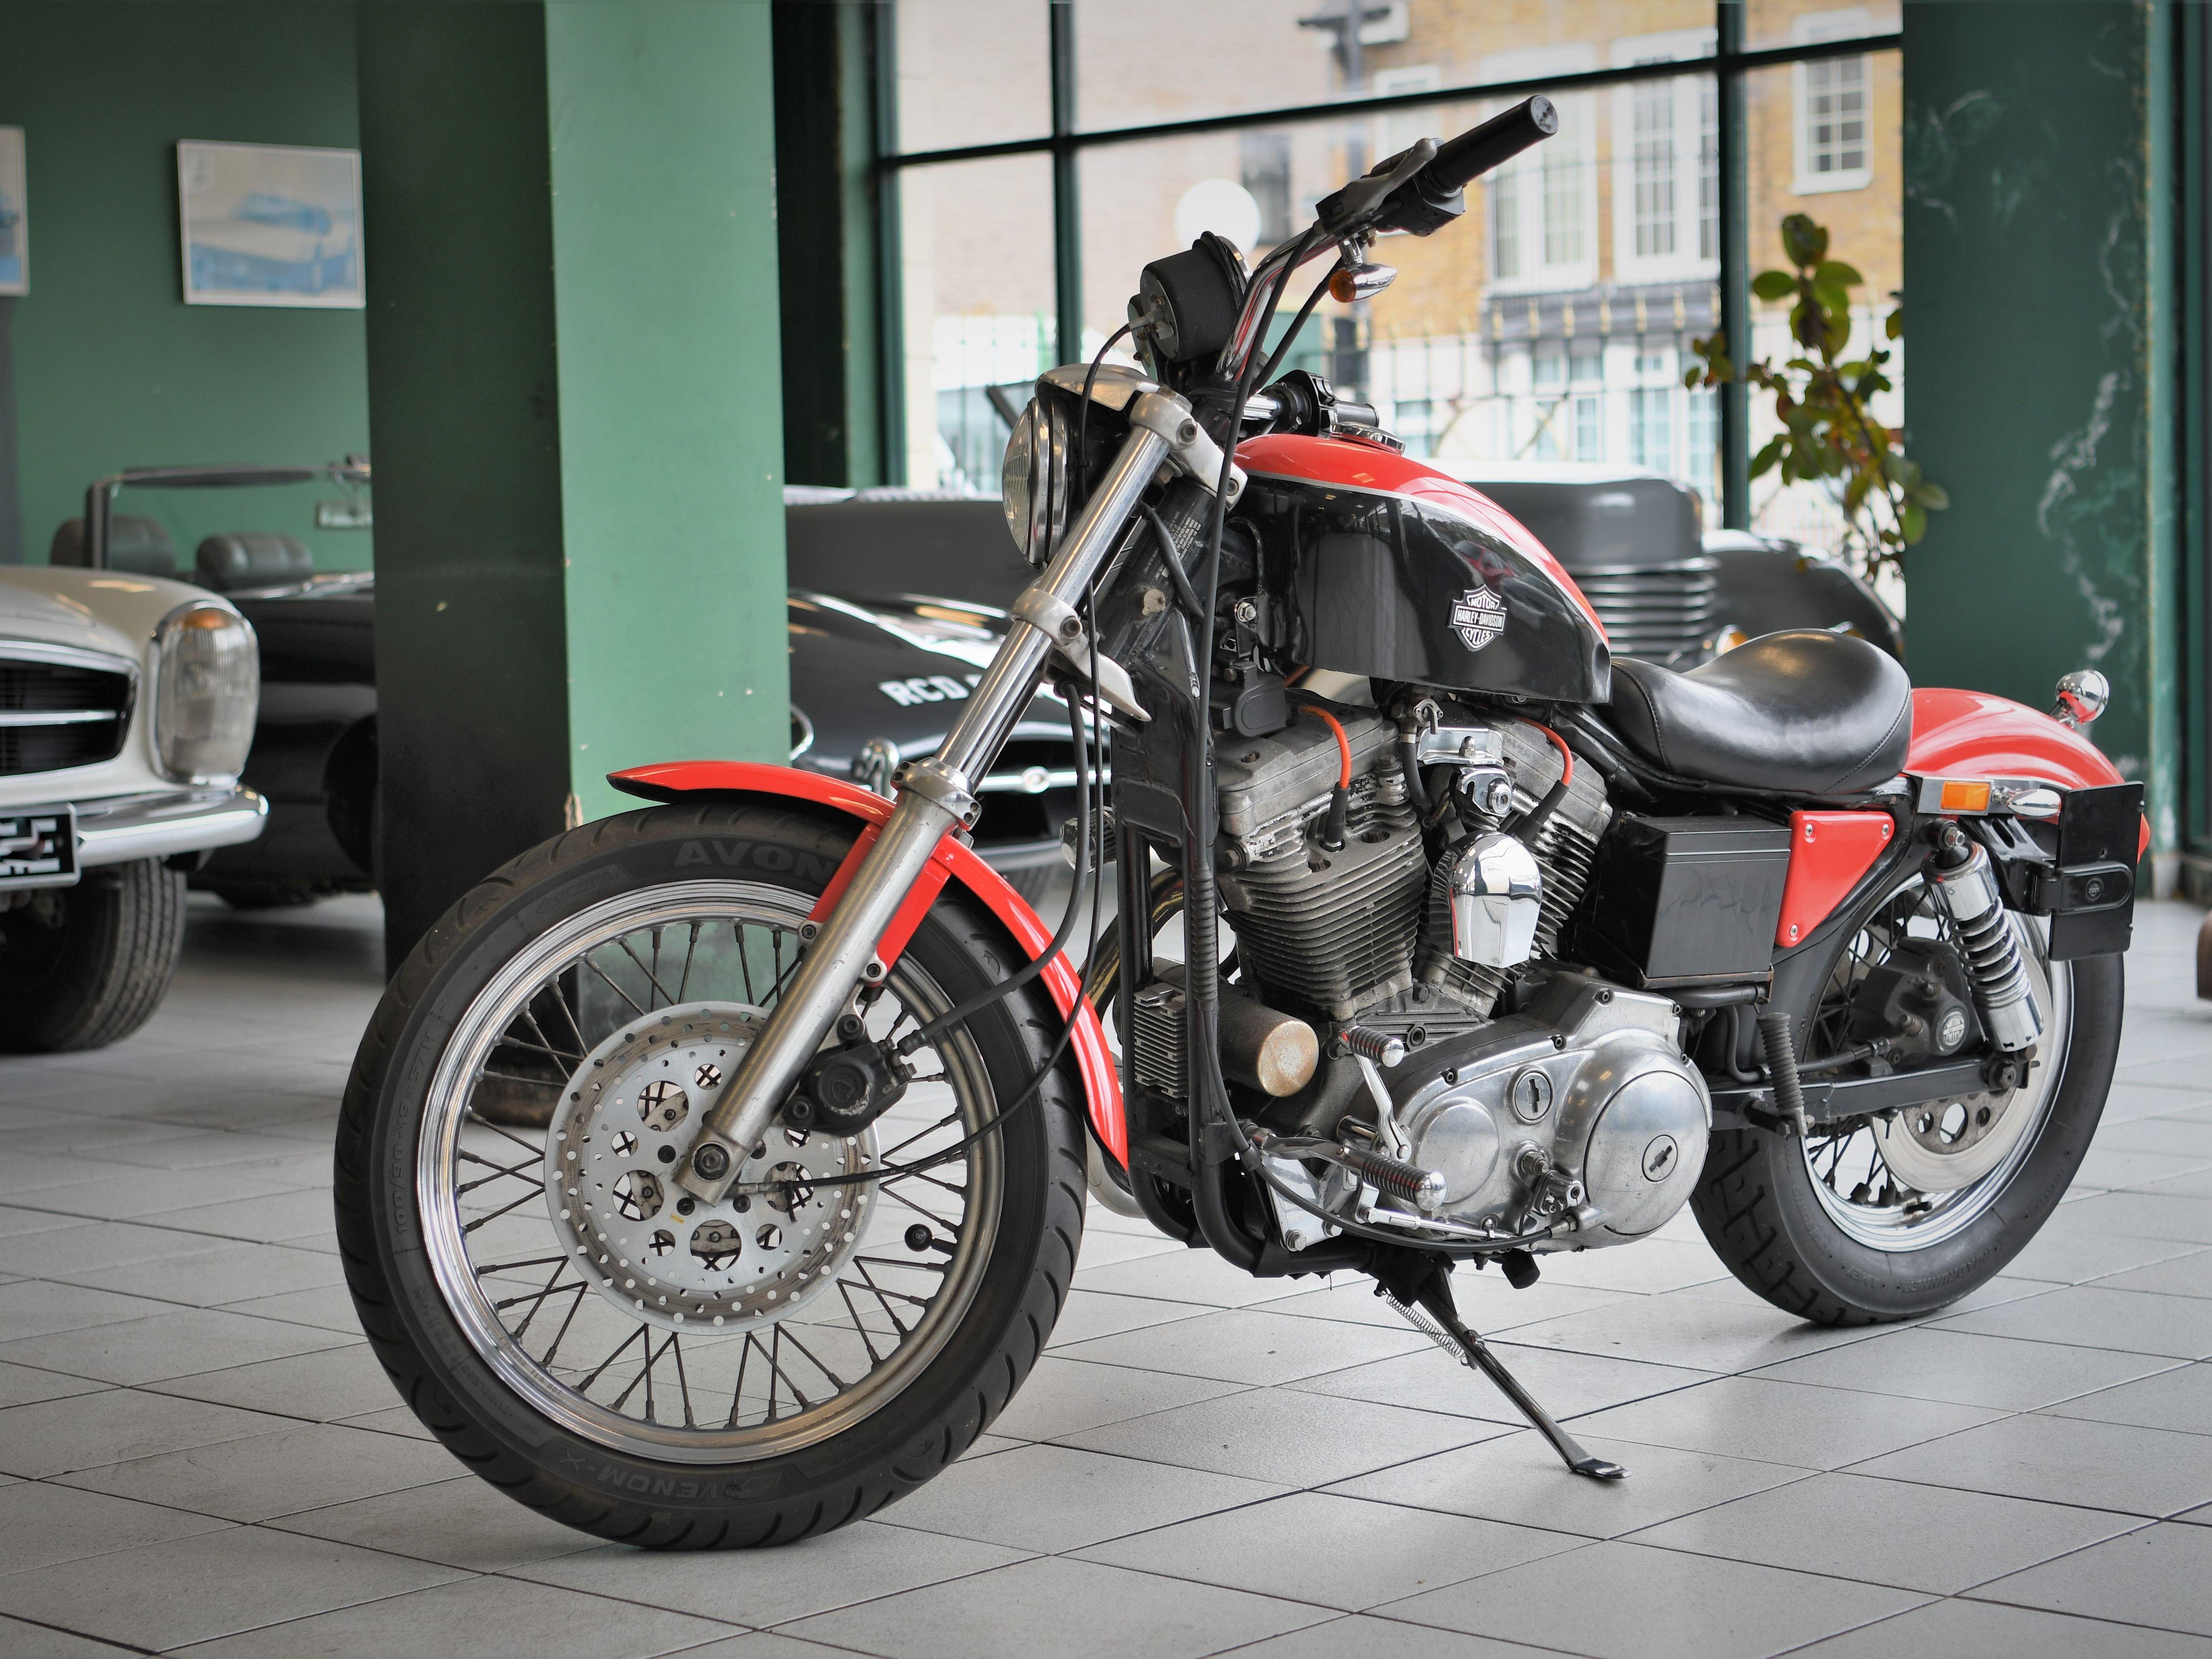 1989 Harley Davidson XL1200 Sportster